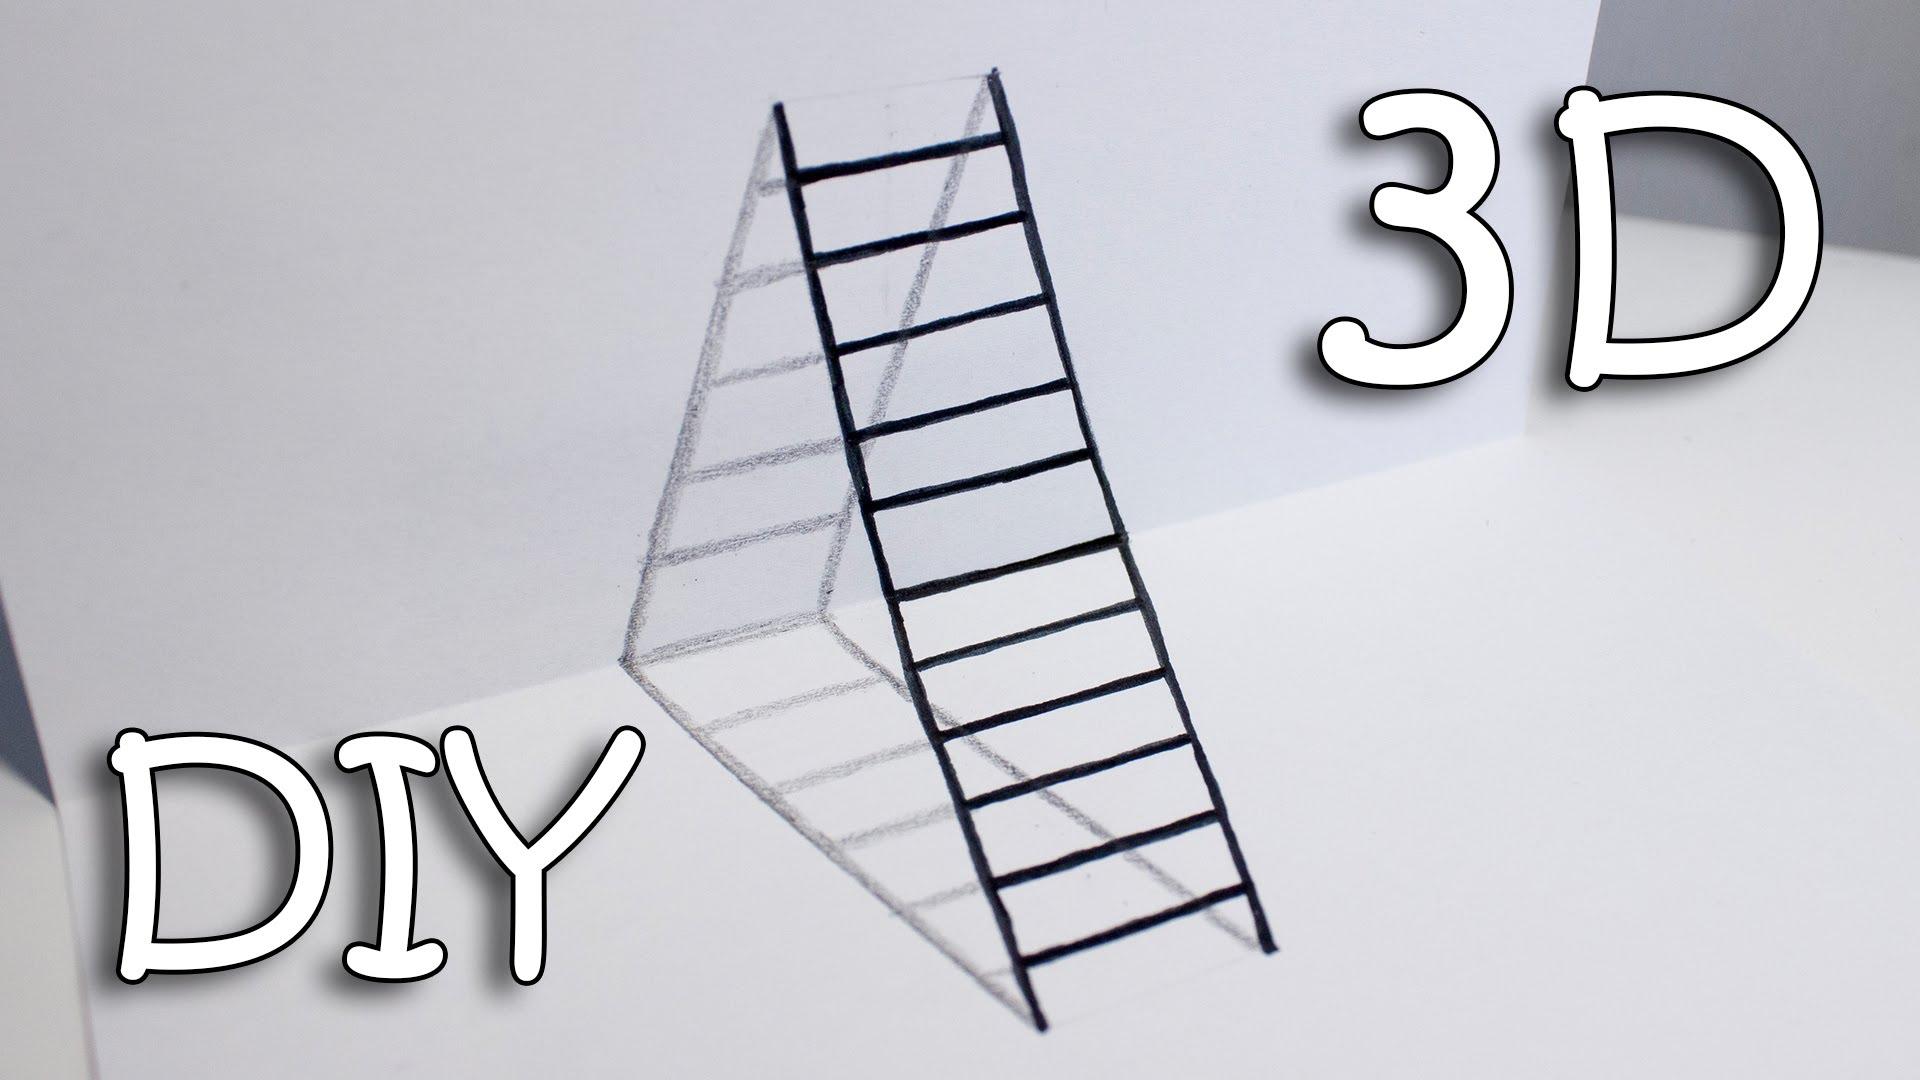 Drawn paper drawing 3d Ladder Ladder Ladder Draw Illusion